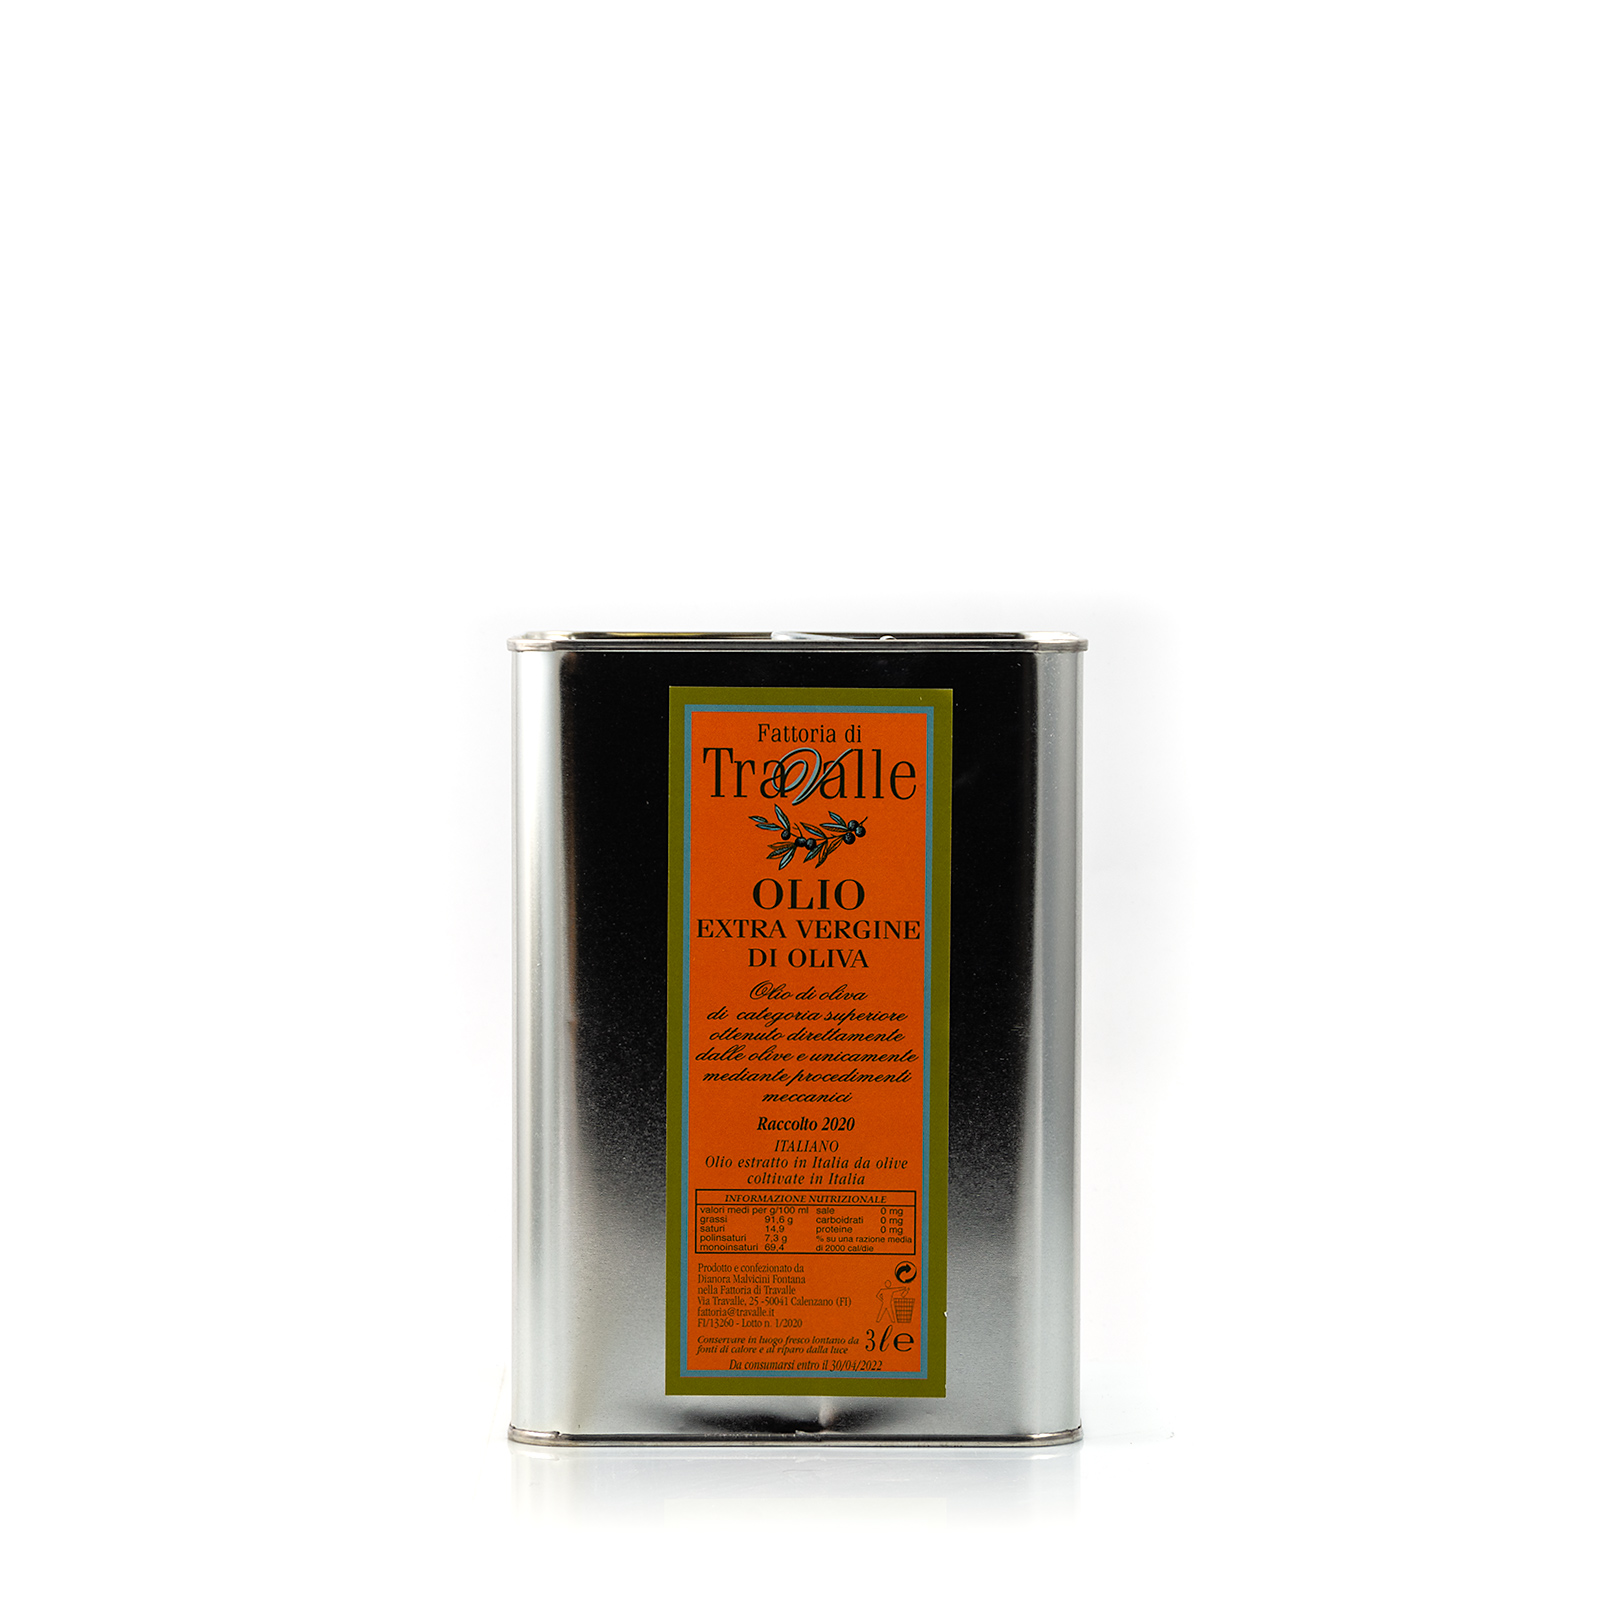 Fattoria di Travalle Olio Extra Vergine di Oliva Travalle - 3l